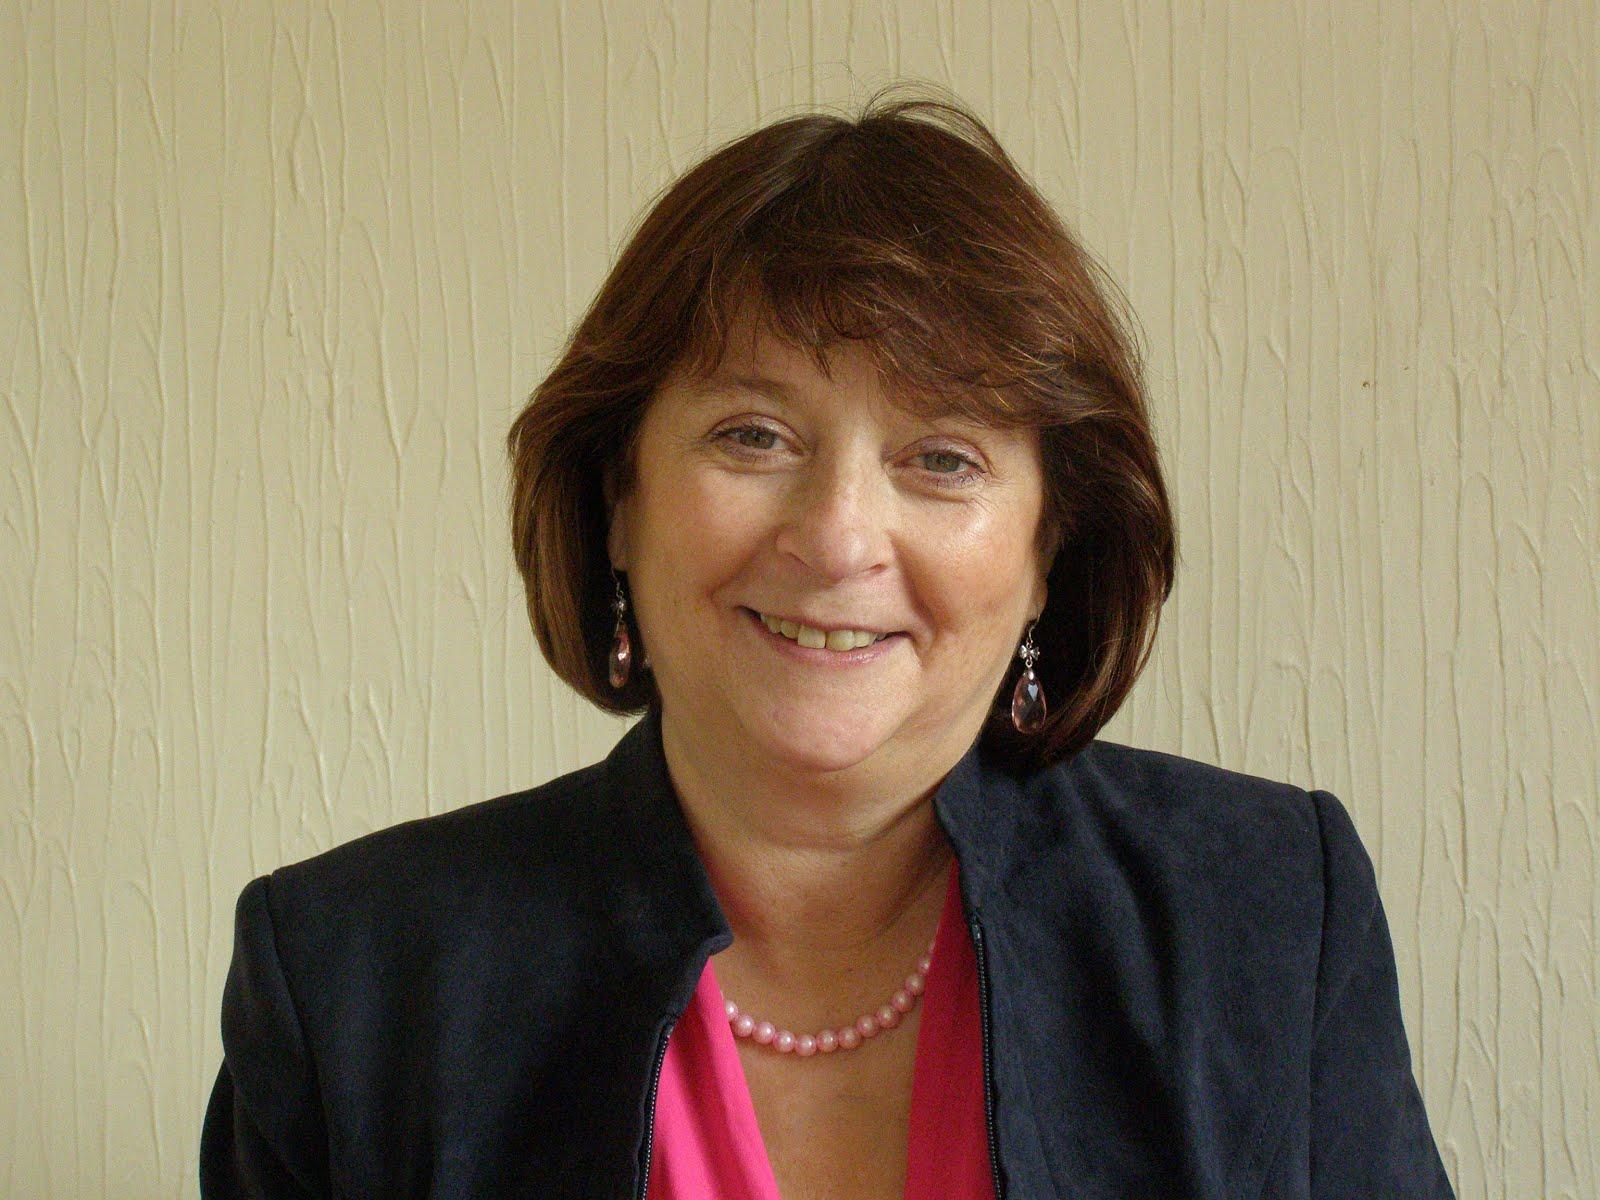 Denise Wyatt